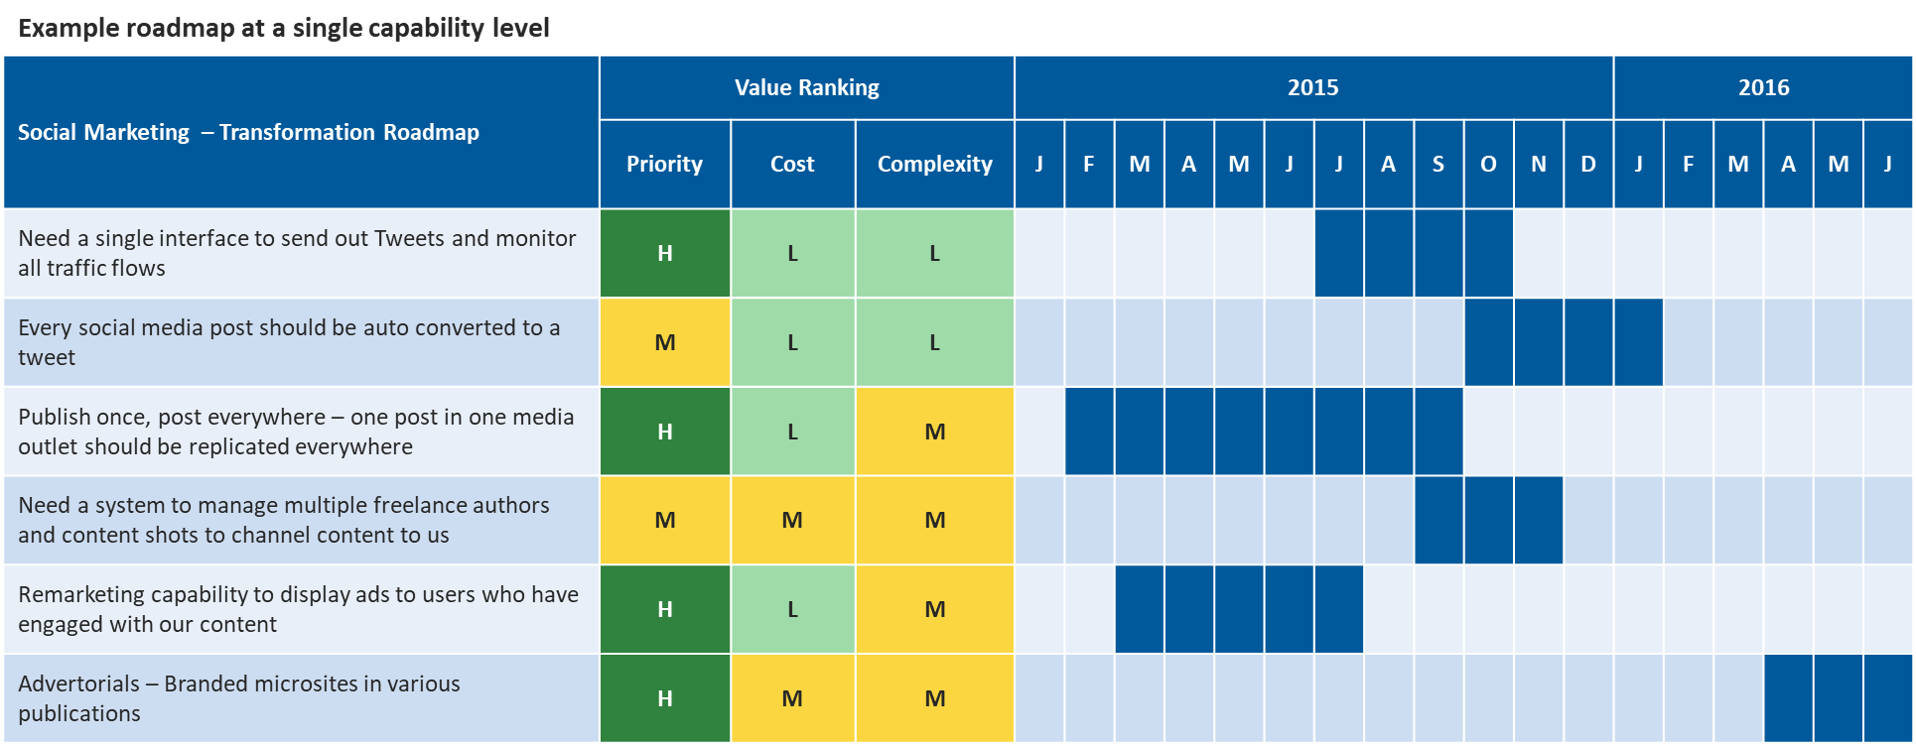 Marketing Transformation Roadmap Sample